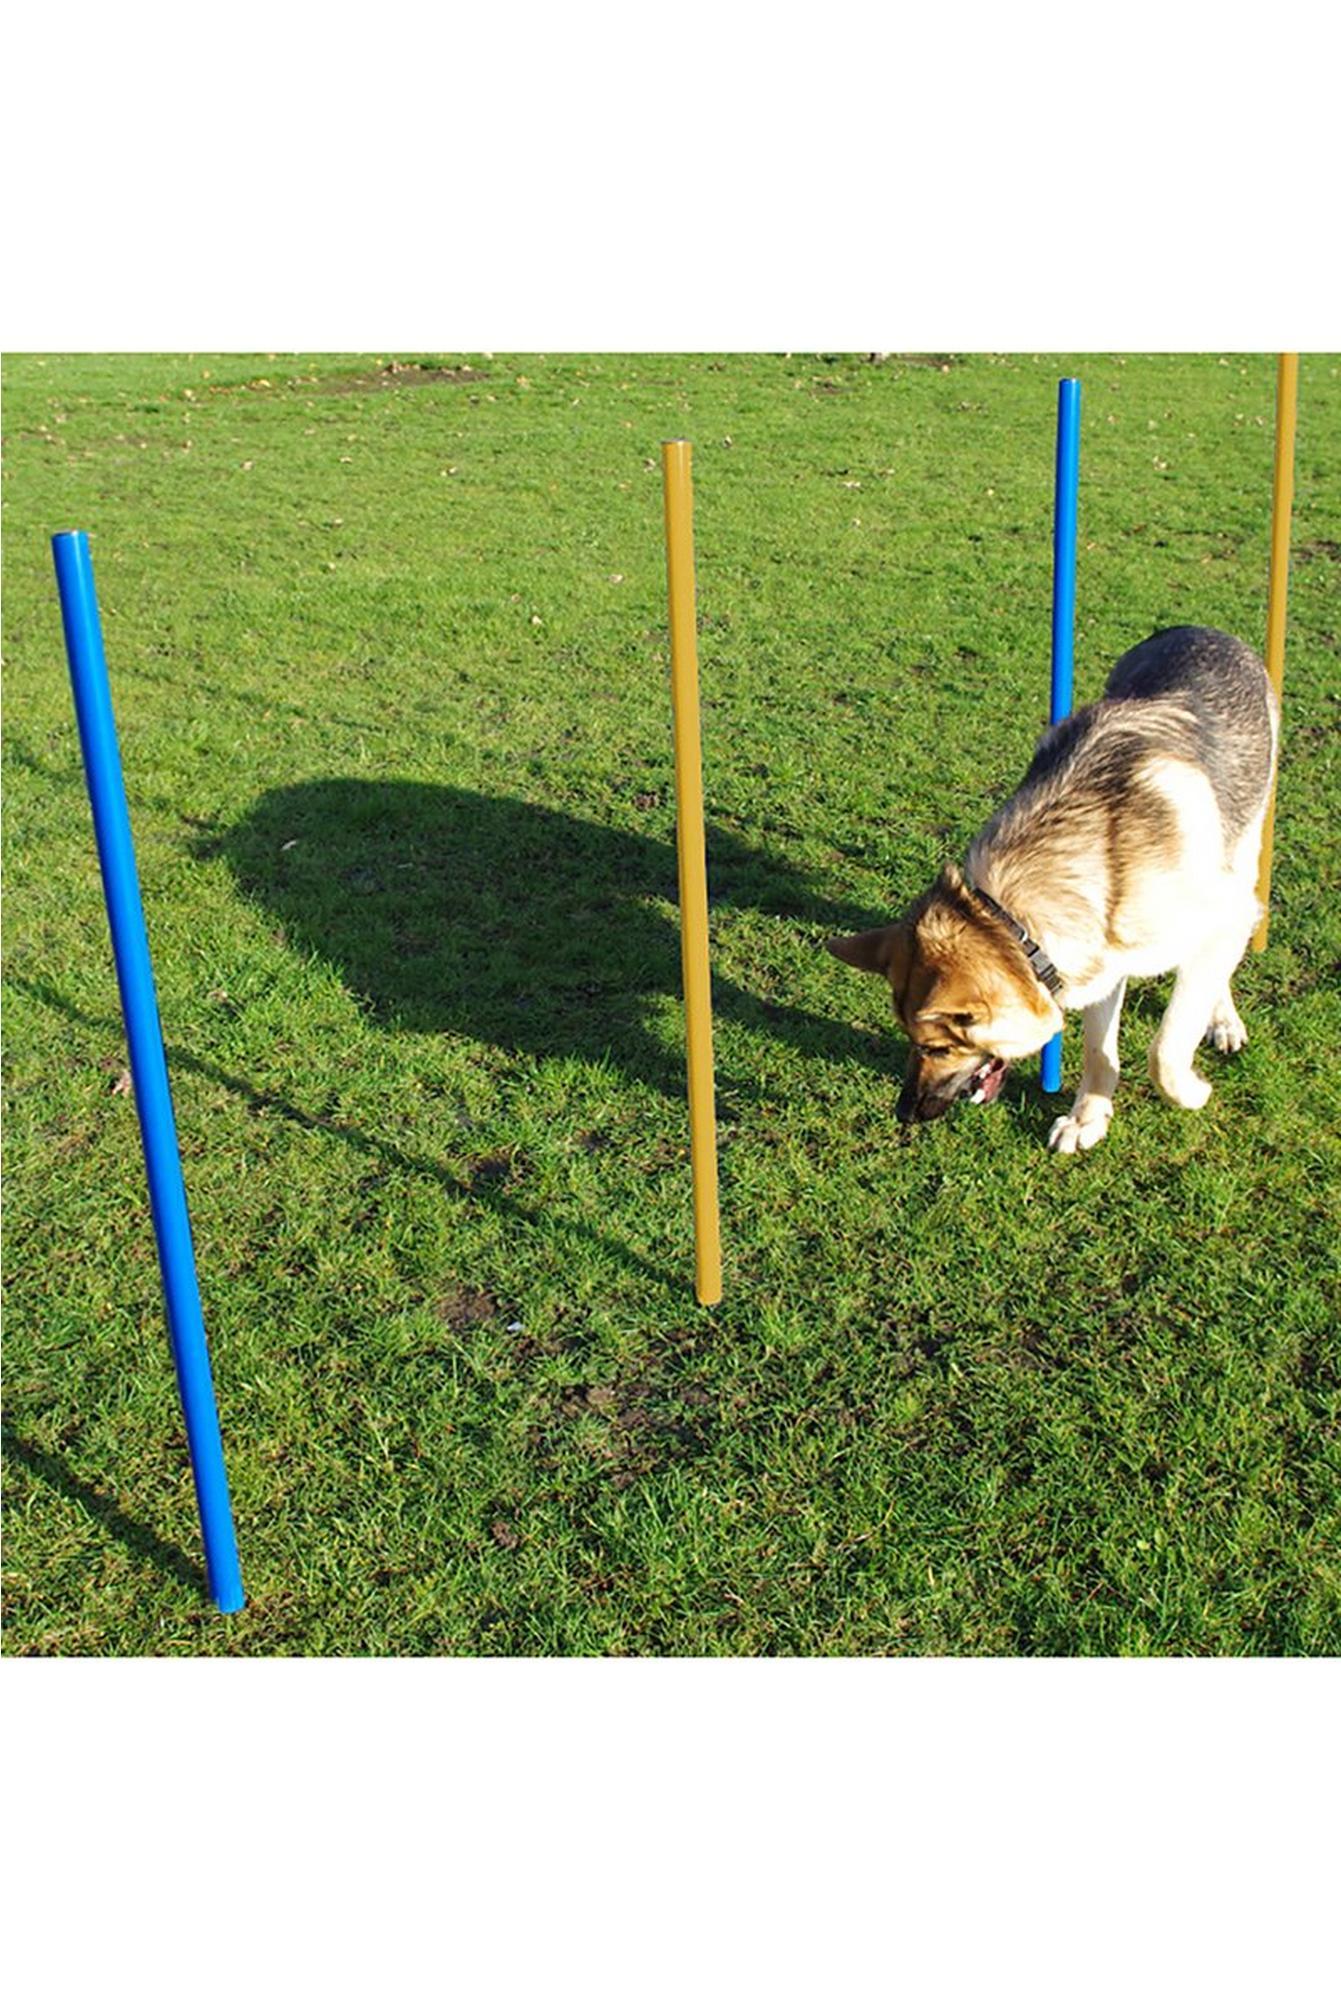 Dog going through slalom poles